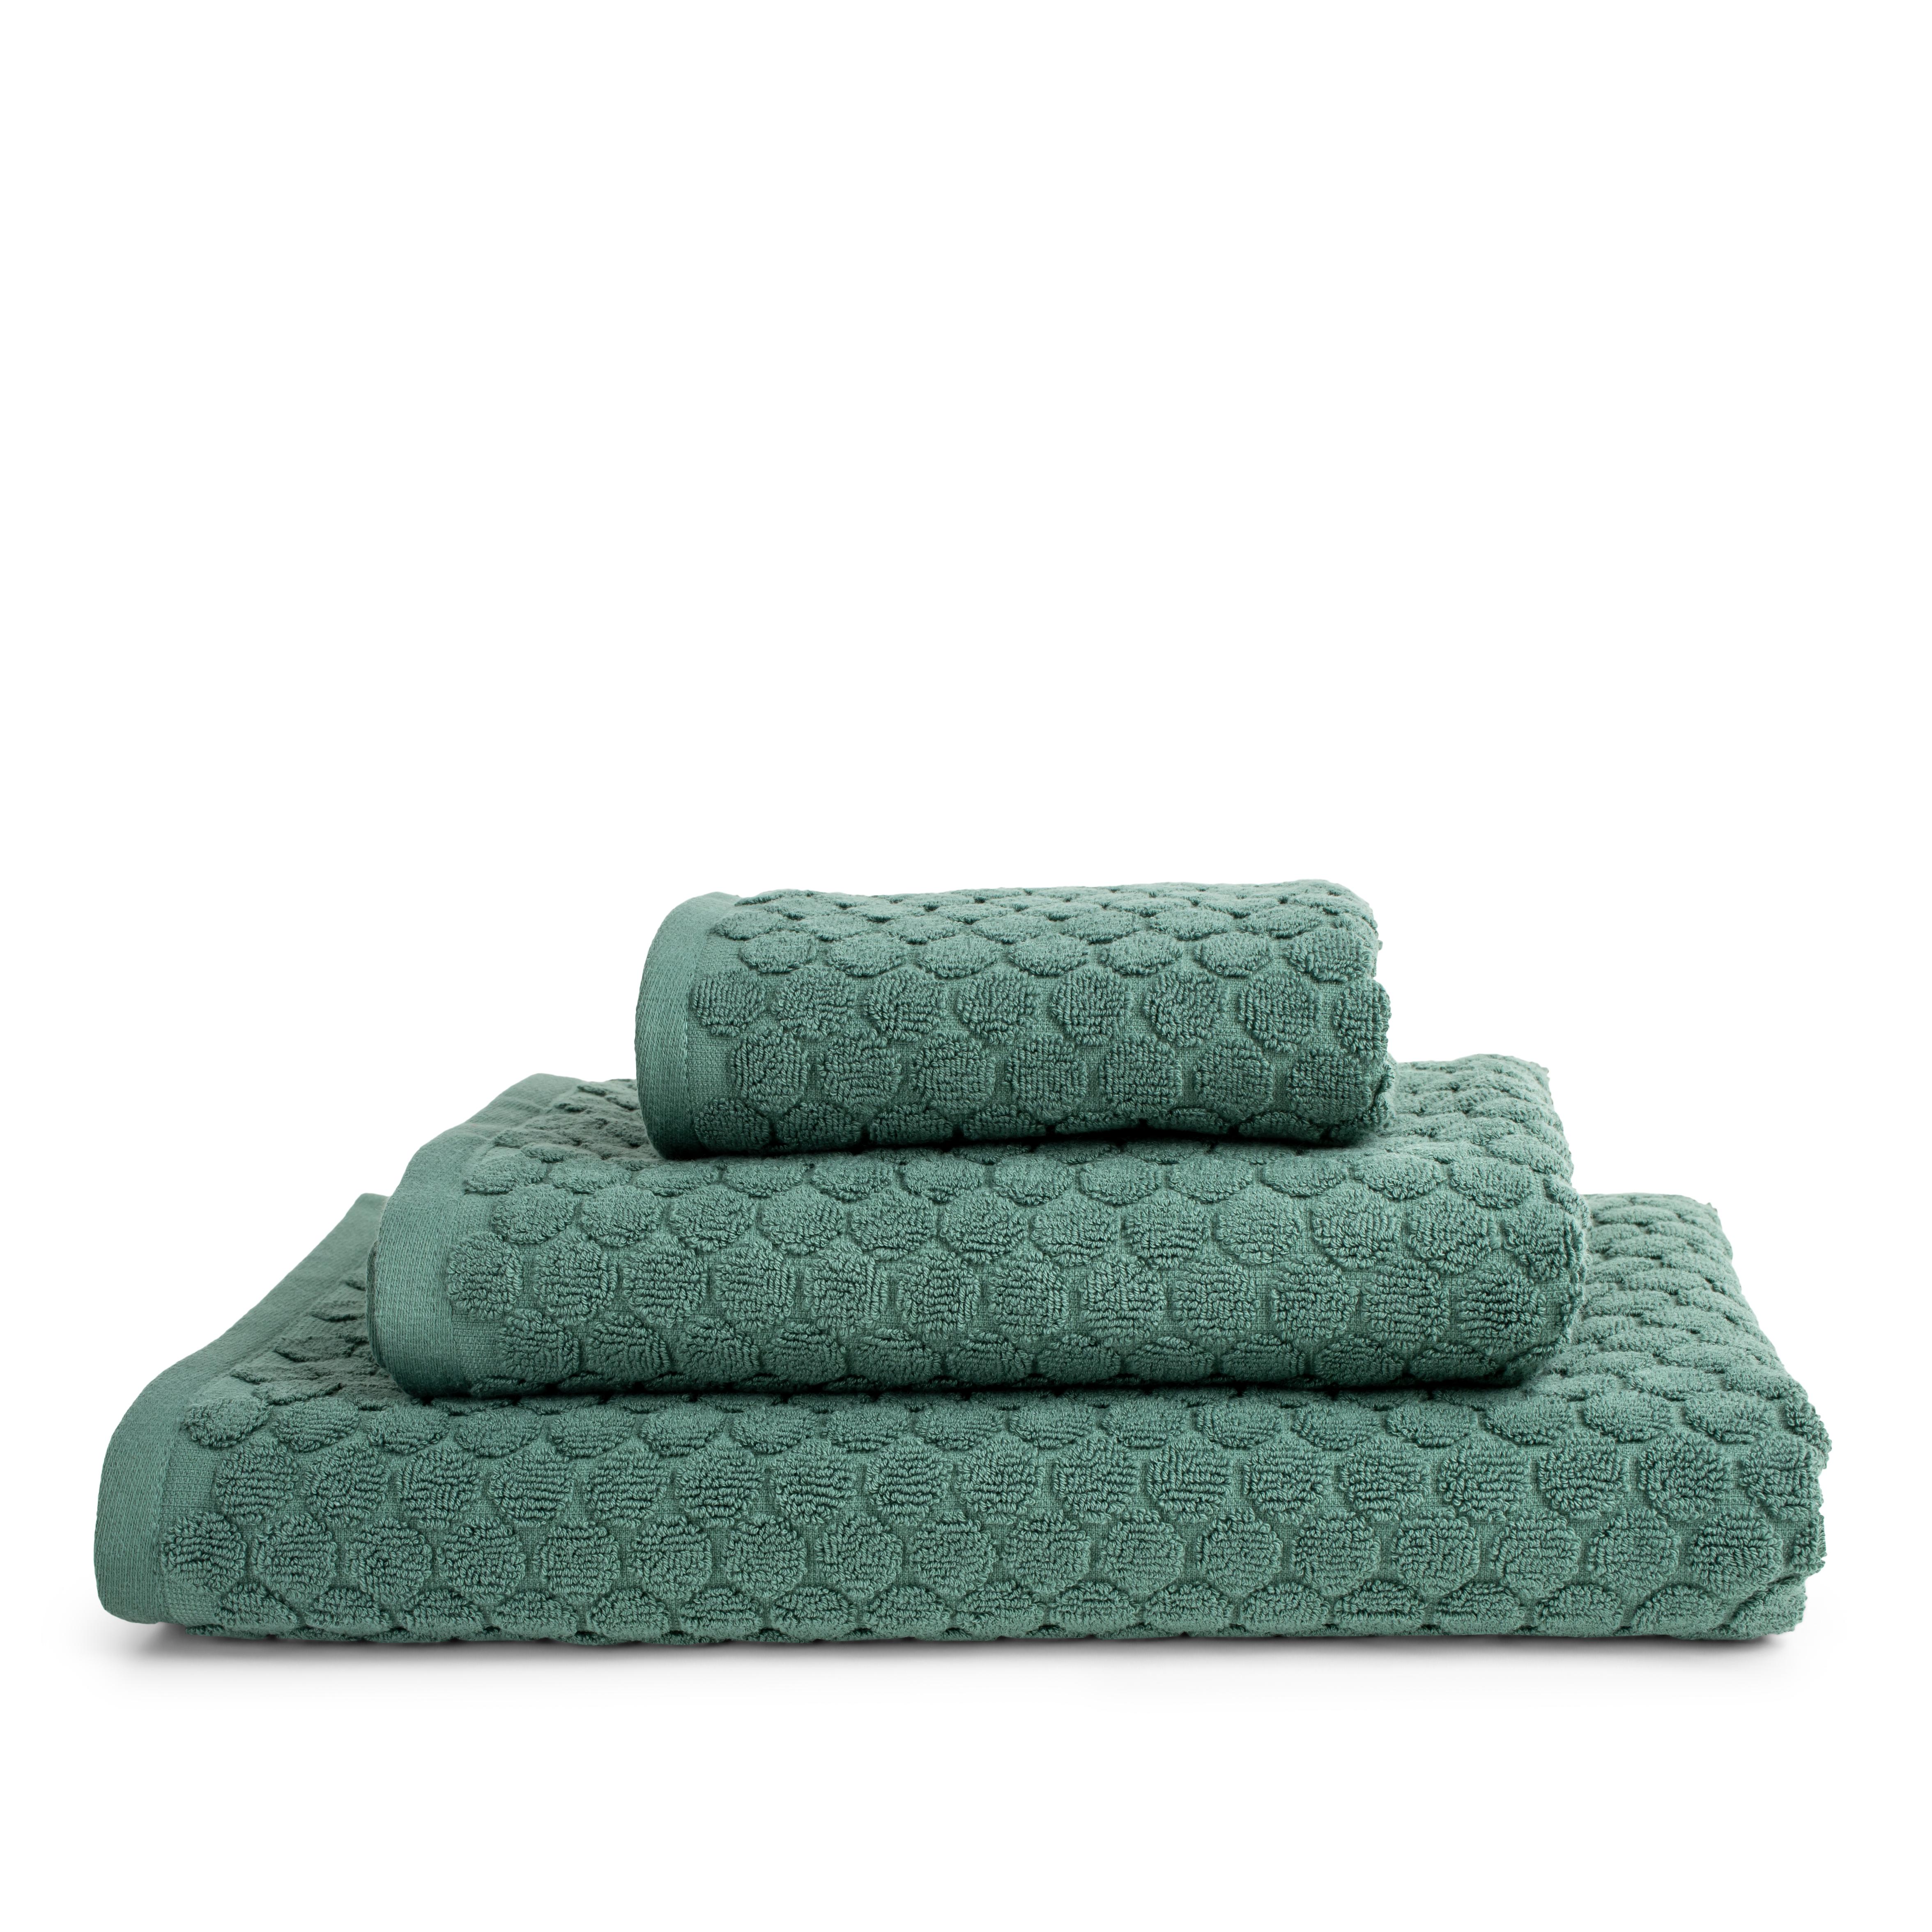 Nordstrand Classic Dot håndklæde, 50x100 cm, støvet grøn